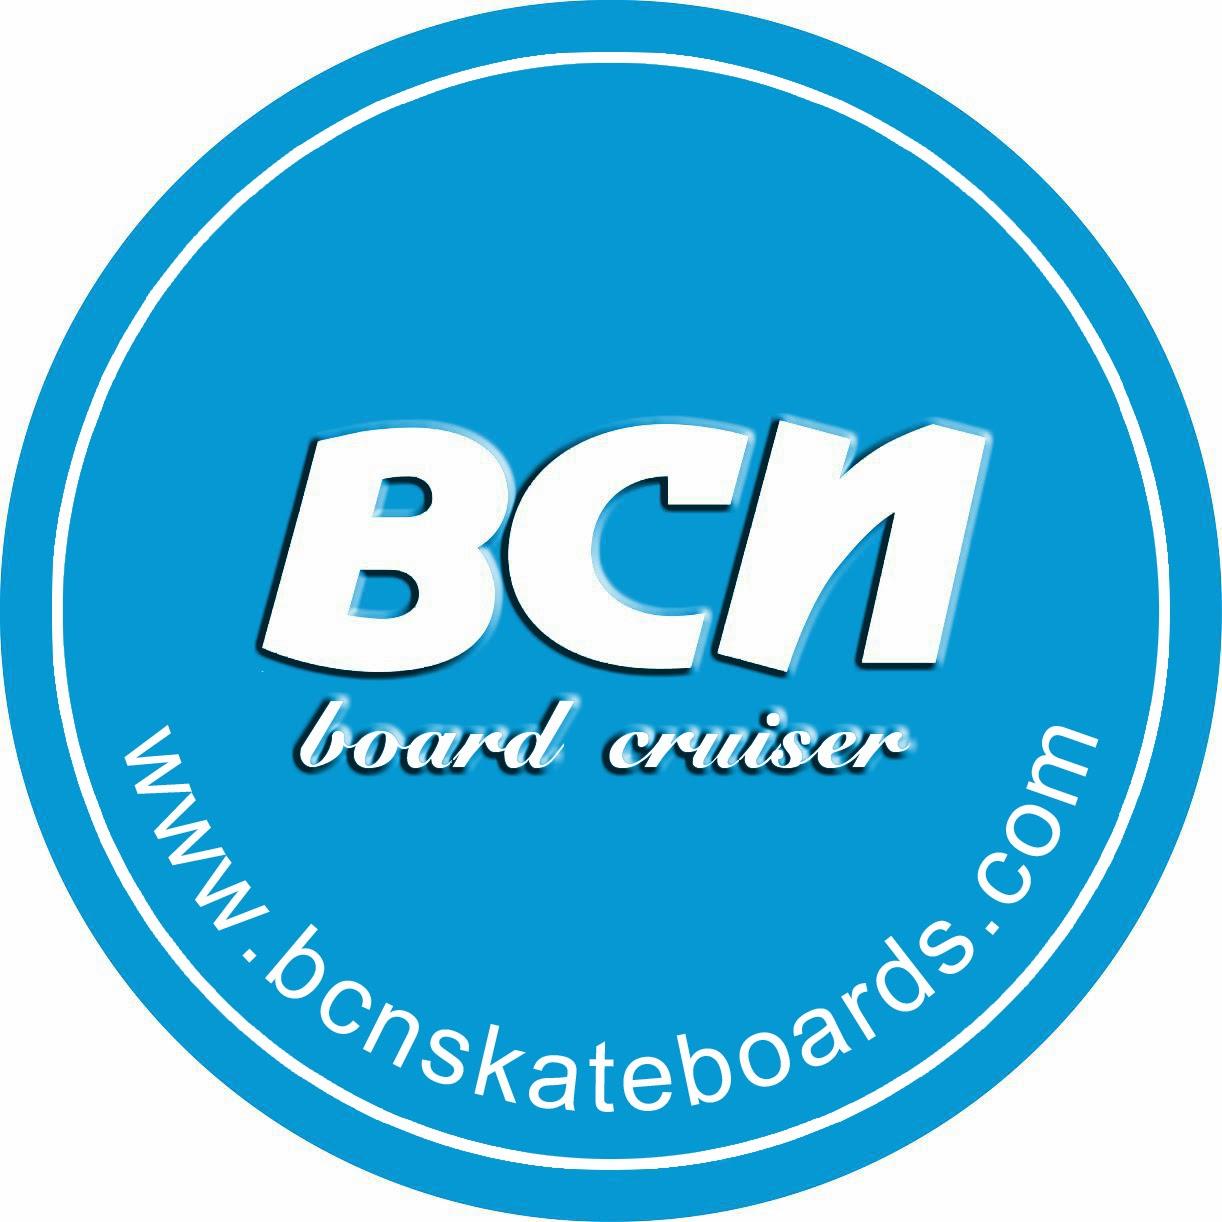 todotabla bcn board cruiser